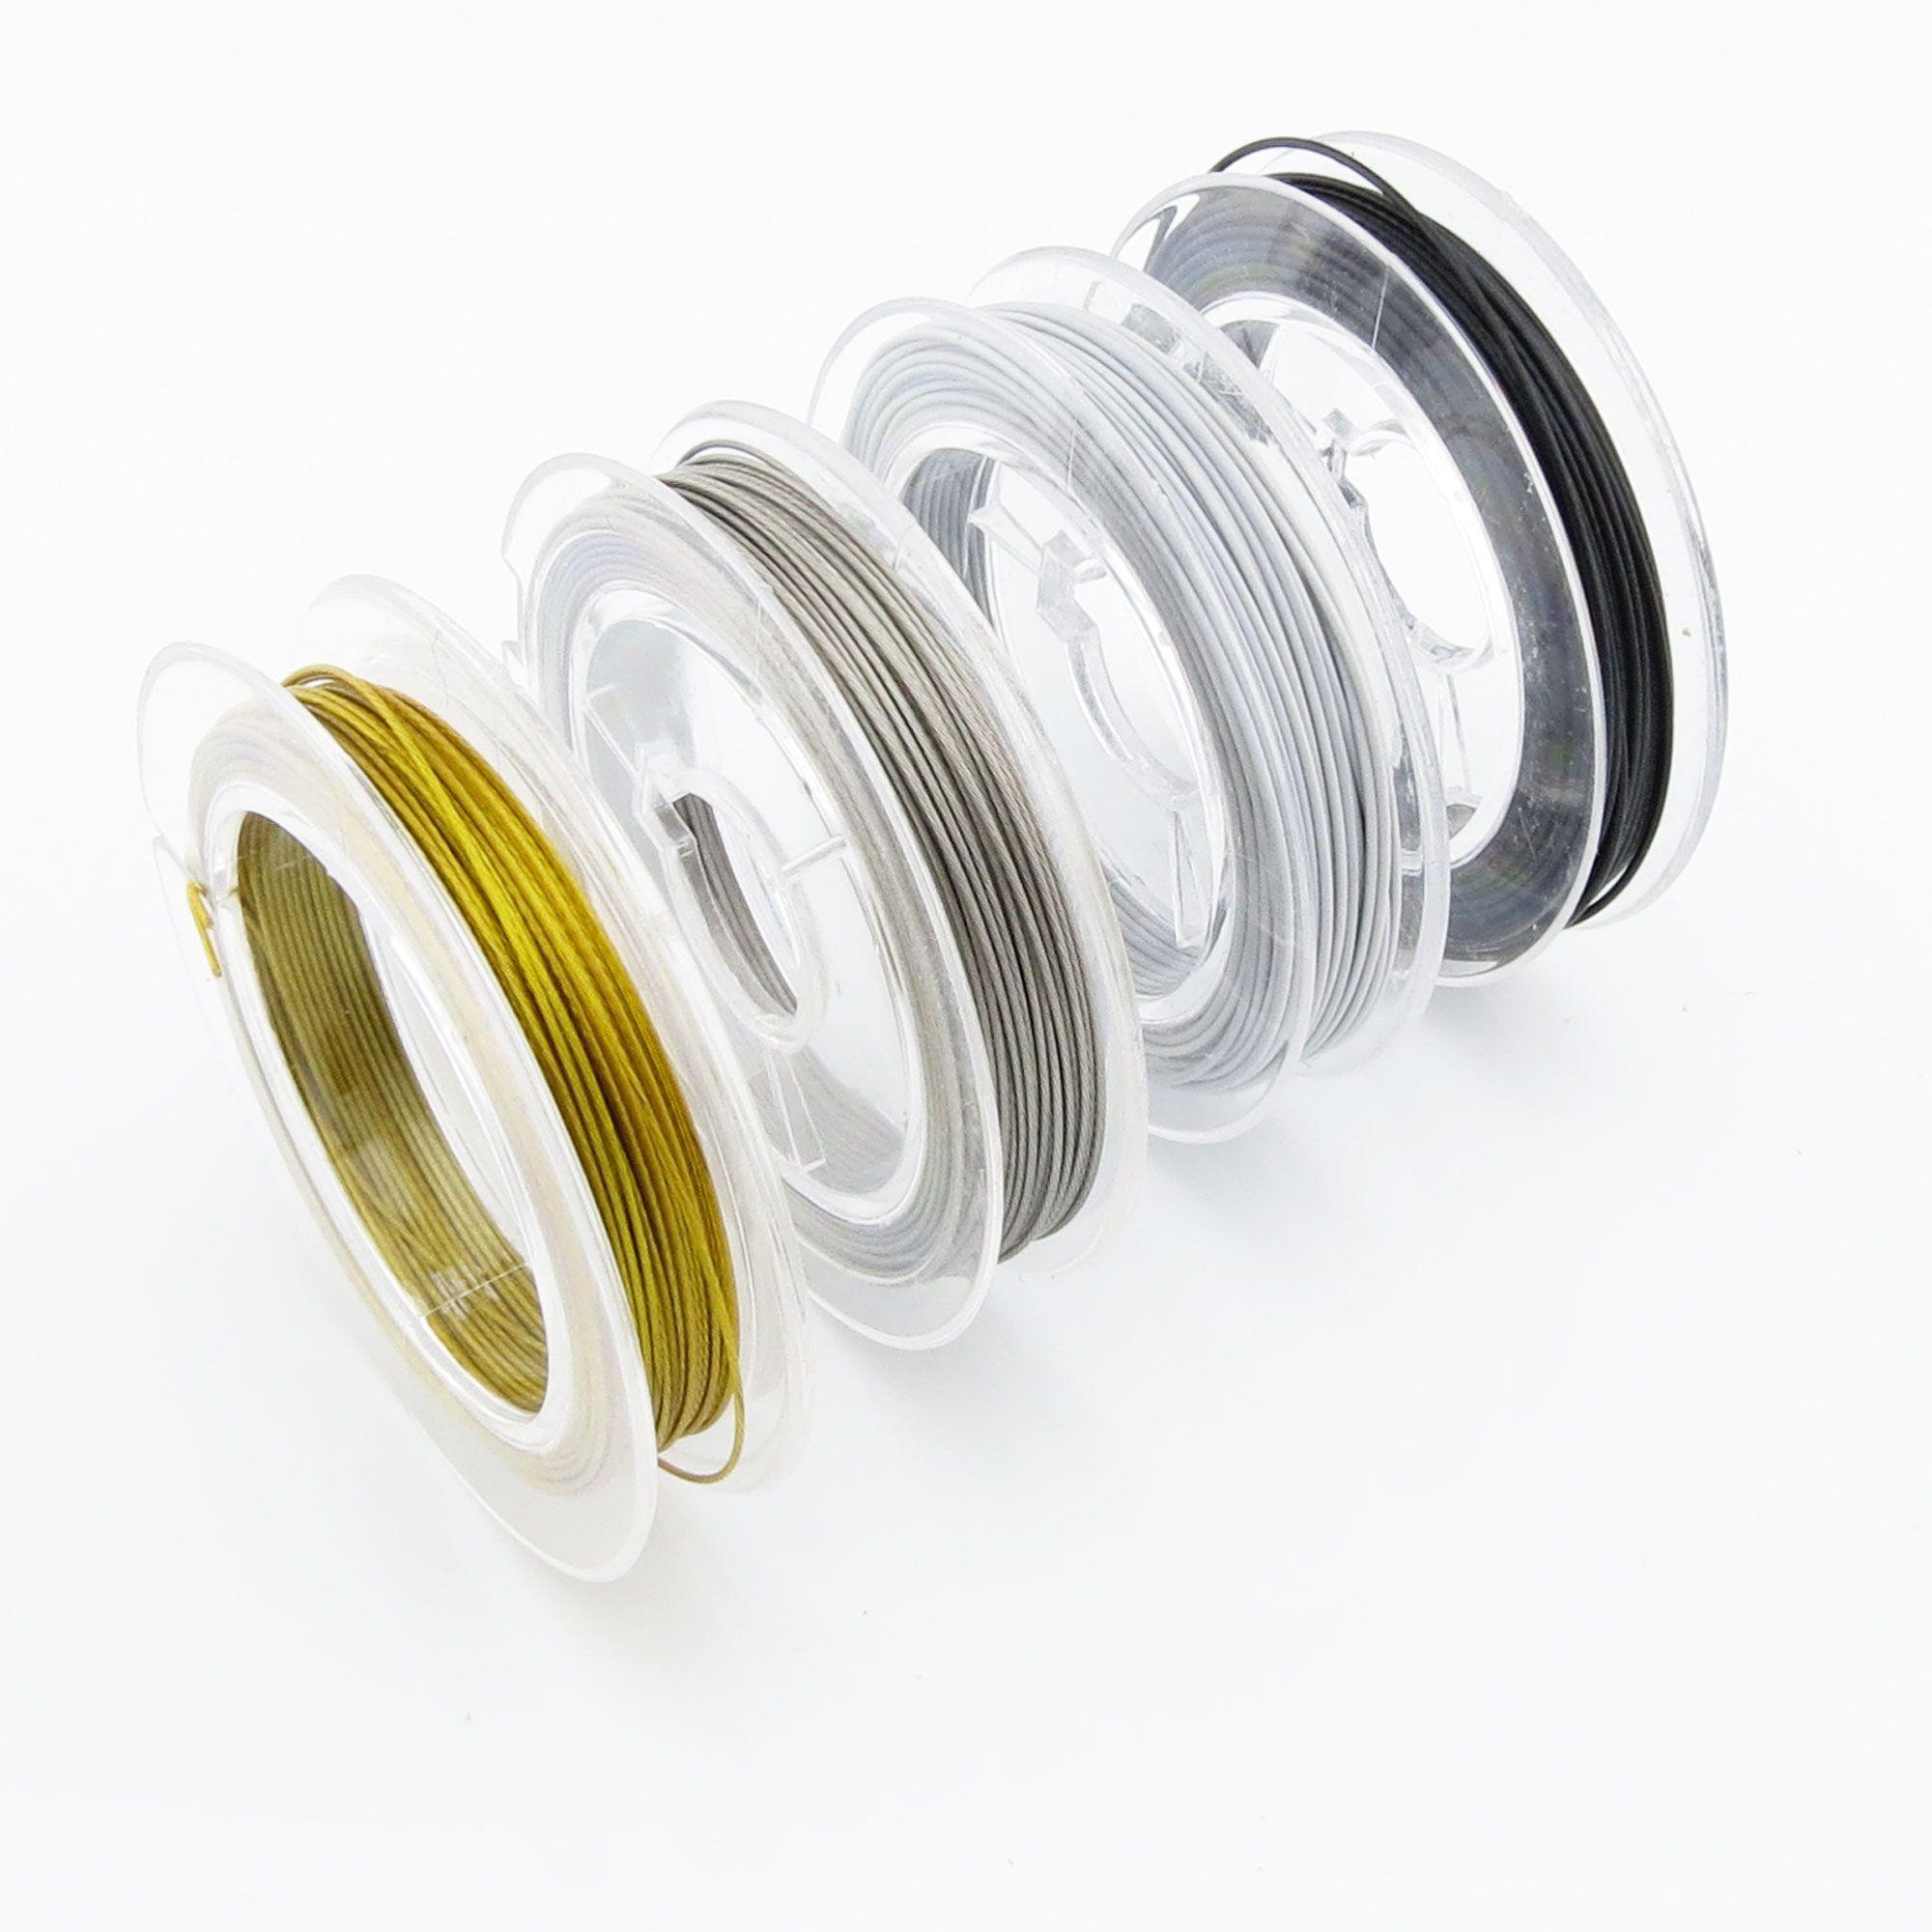 10m Schmuckdraht 0,6mm (0,22€ pro m) silber gold weiß Draht ...